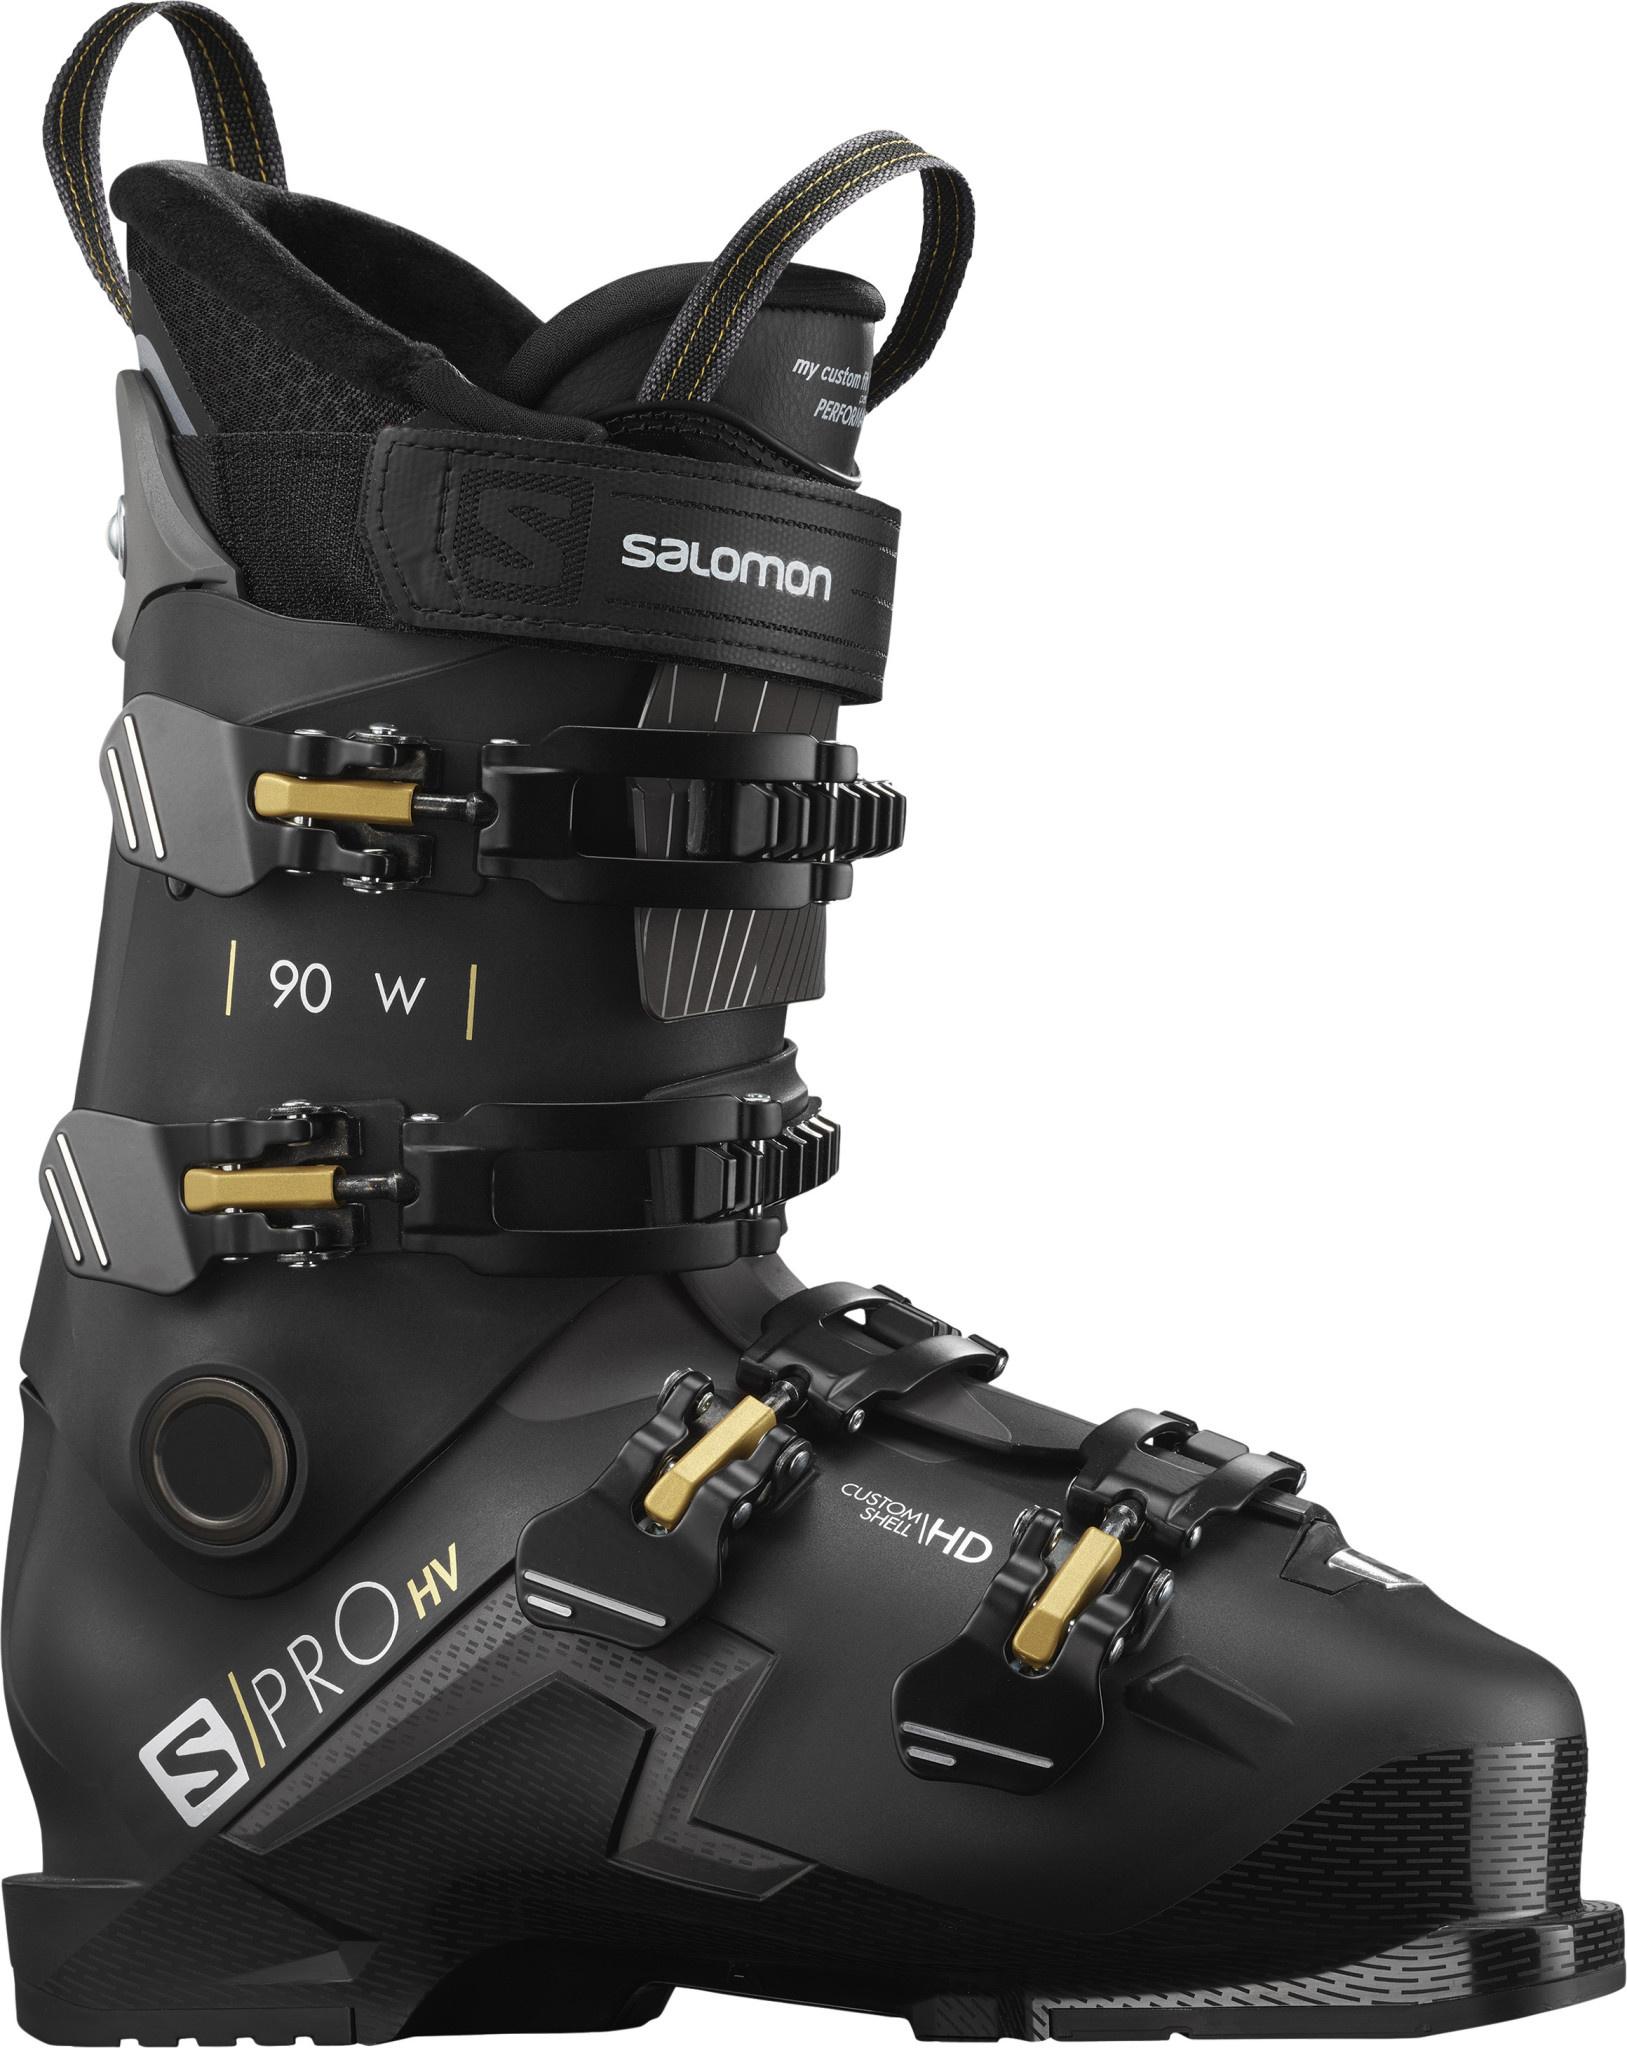 Salomon S/Pro HV 90 W-1